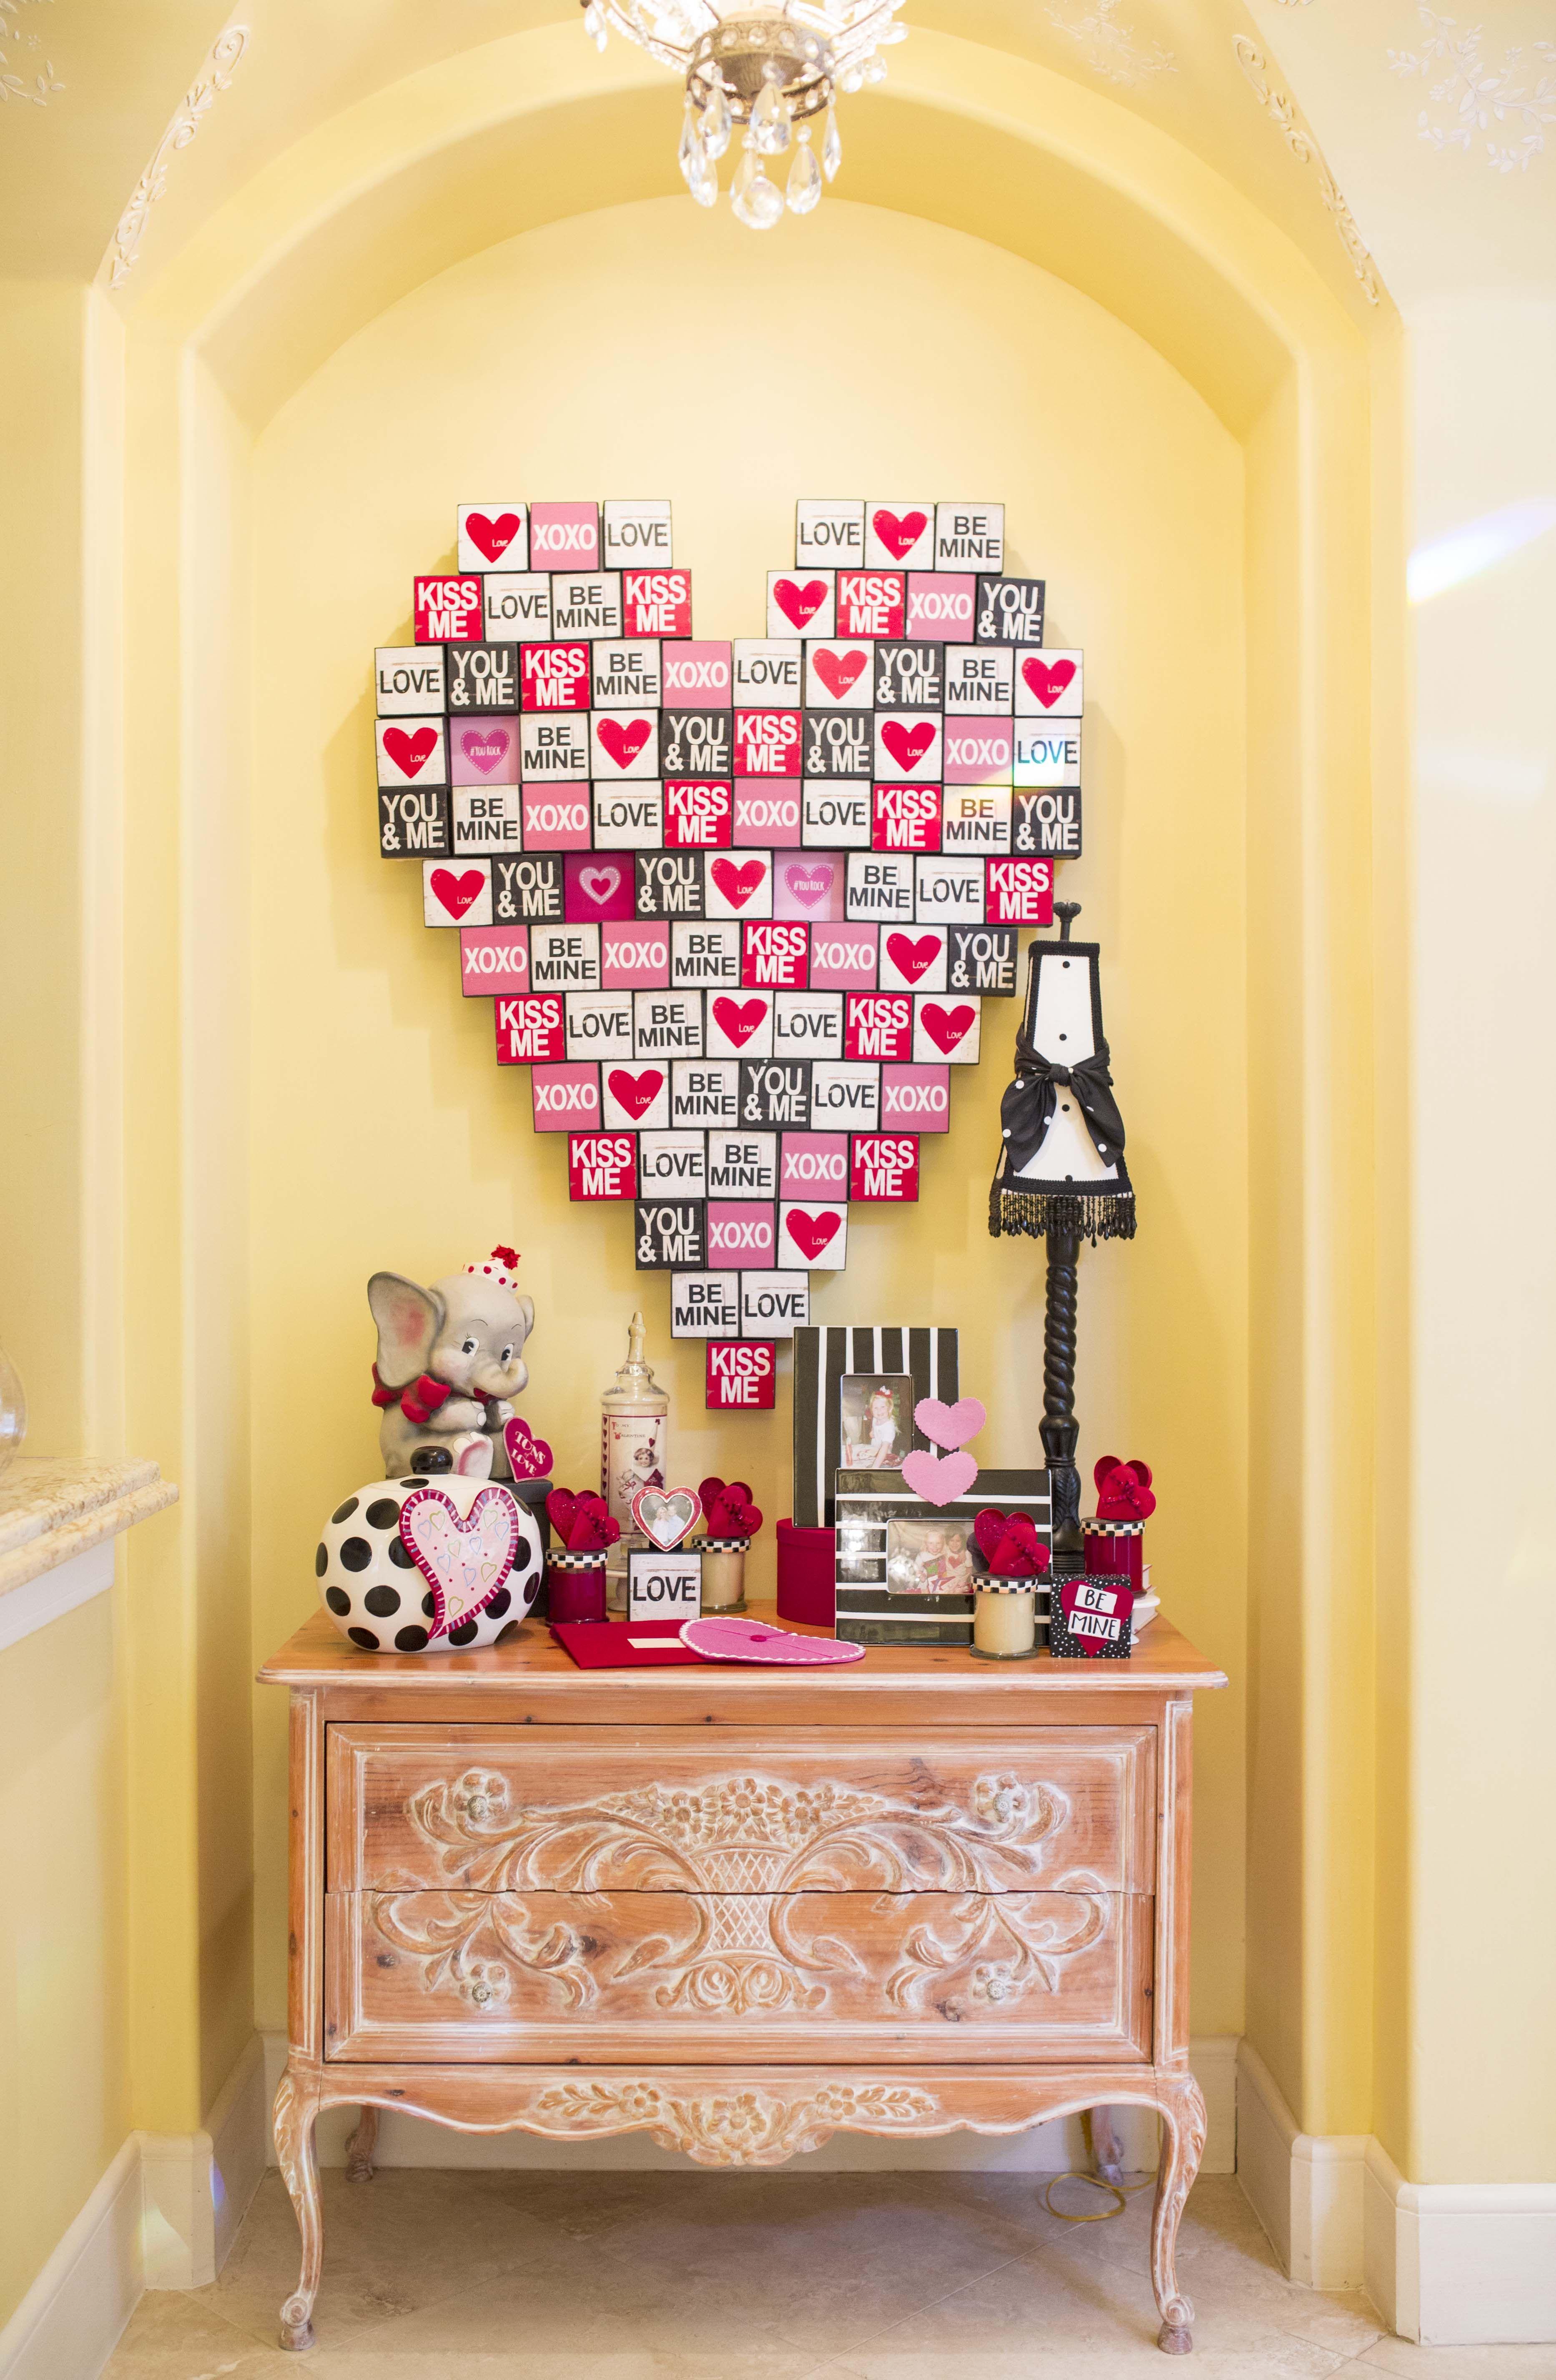 Valentine\'s Day decor. | Celebrate Love: Valentine\'s Day ...